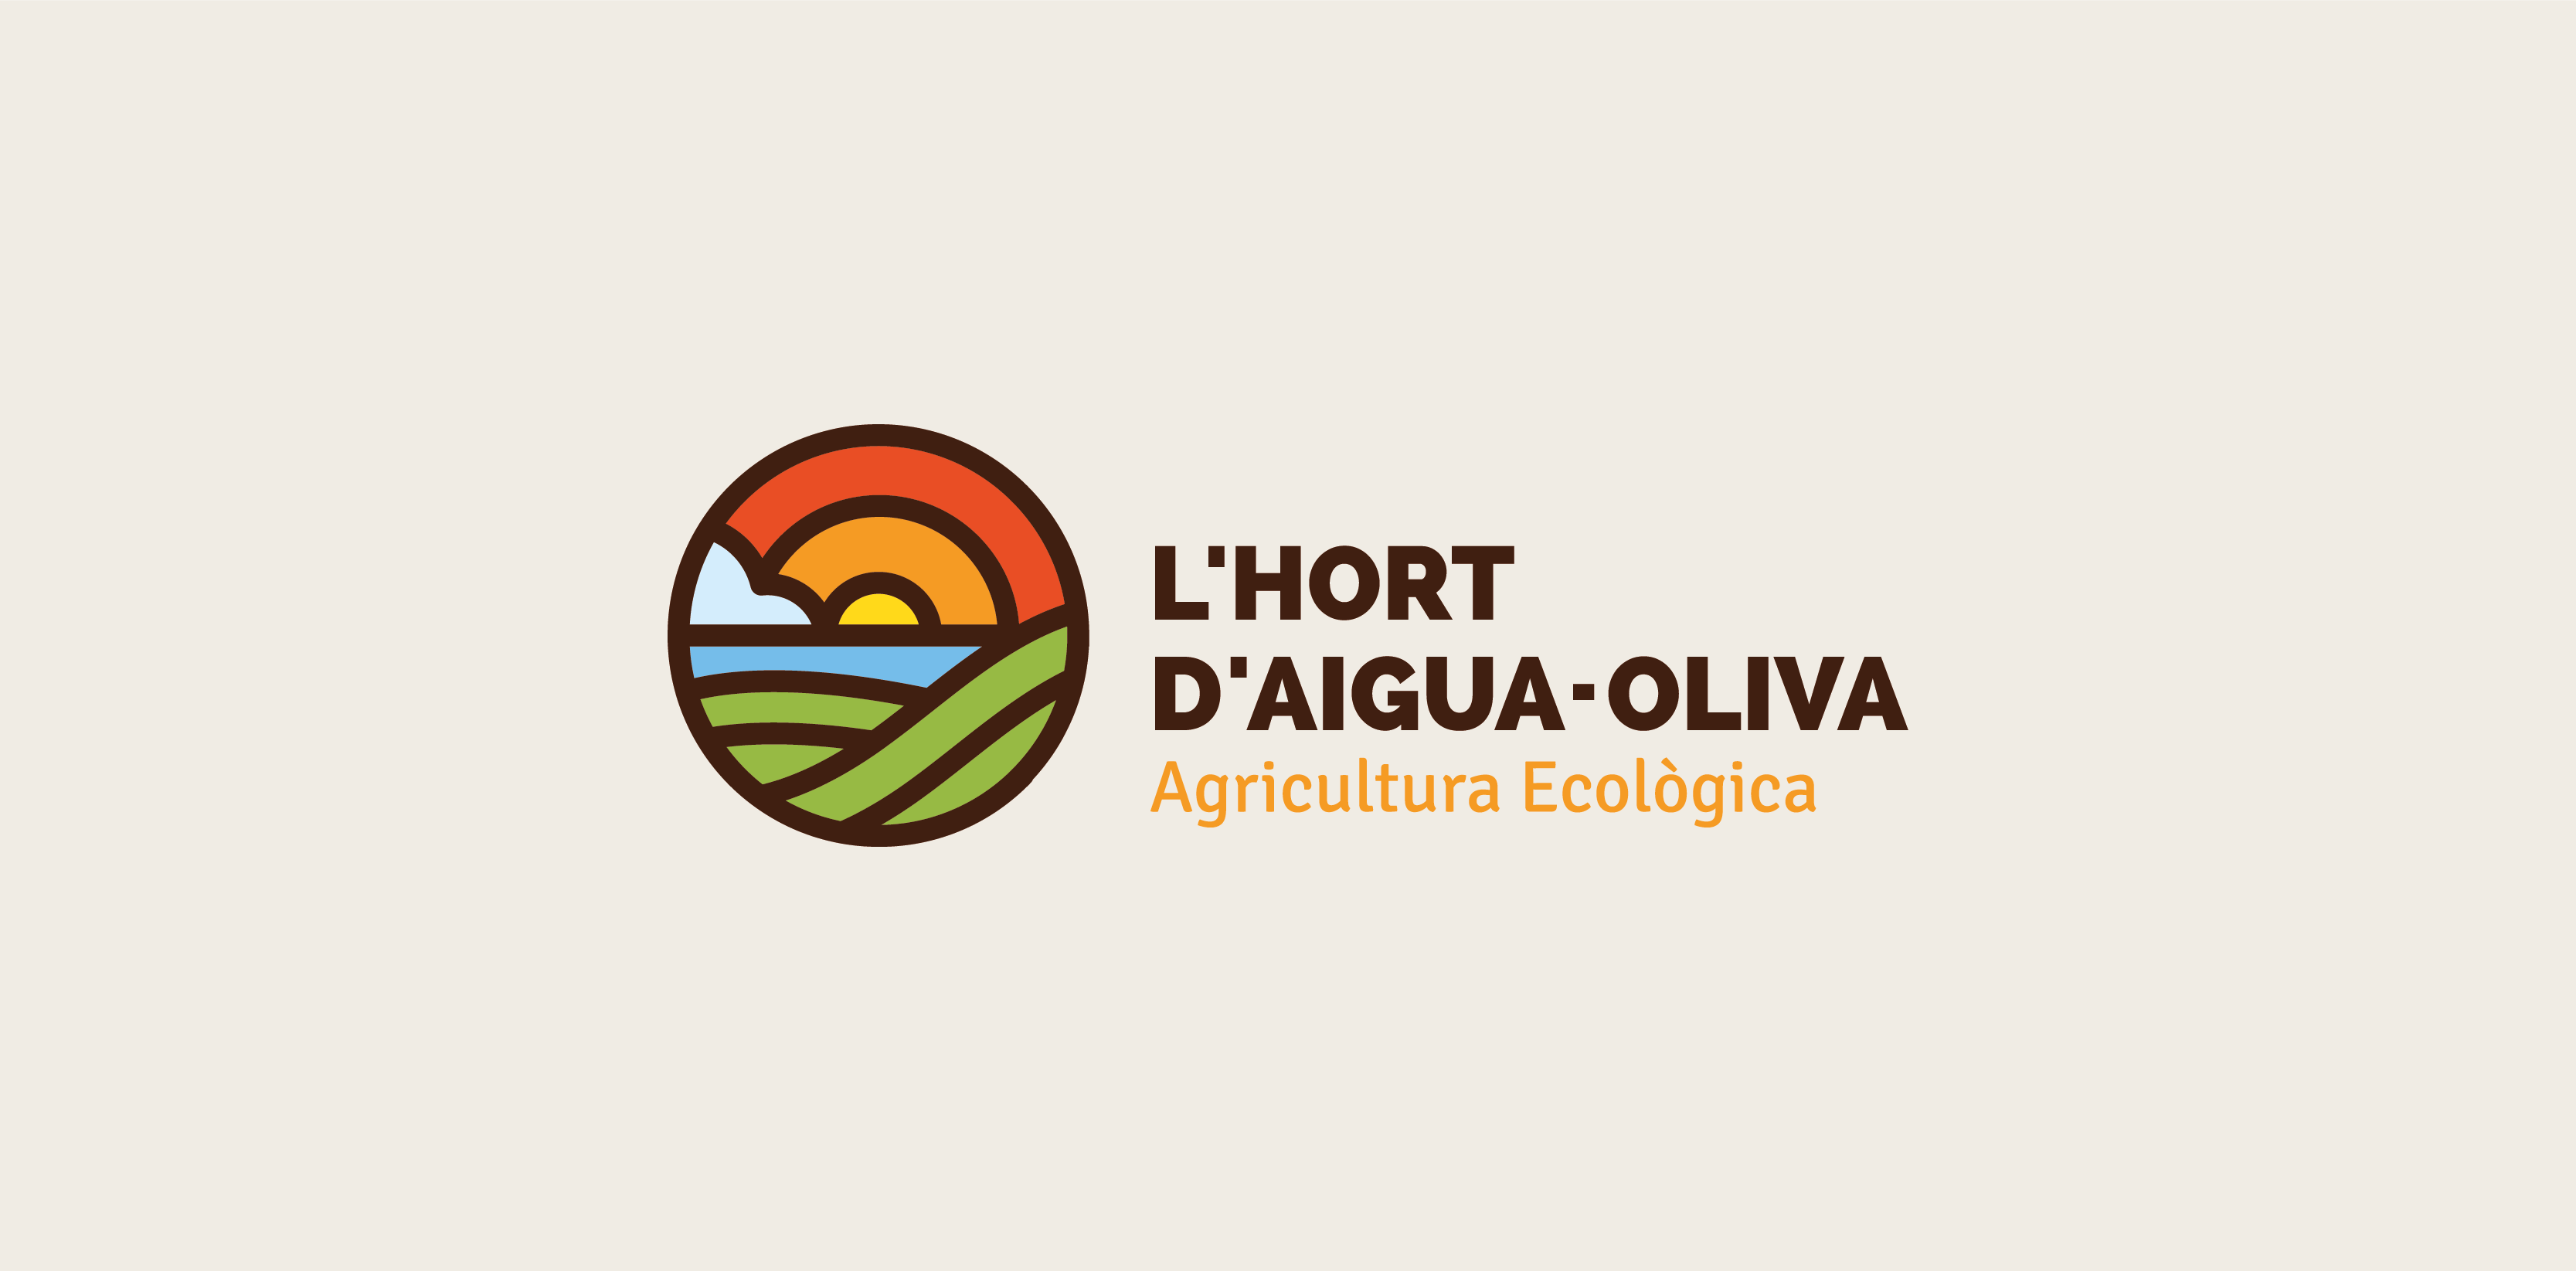 L´Hort d'Aigua-Oliva, Diseño de Logotipo para empresa dedicada a la agricultura ecológica y ubicada en la costa Mediterránea